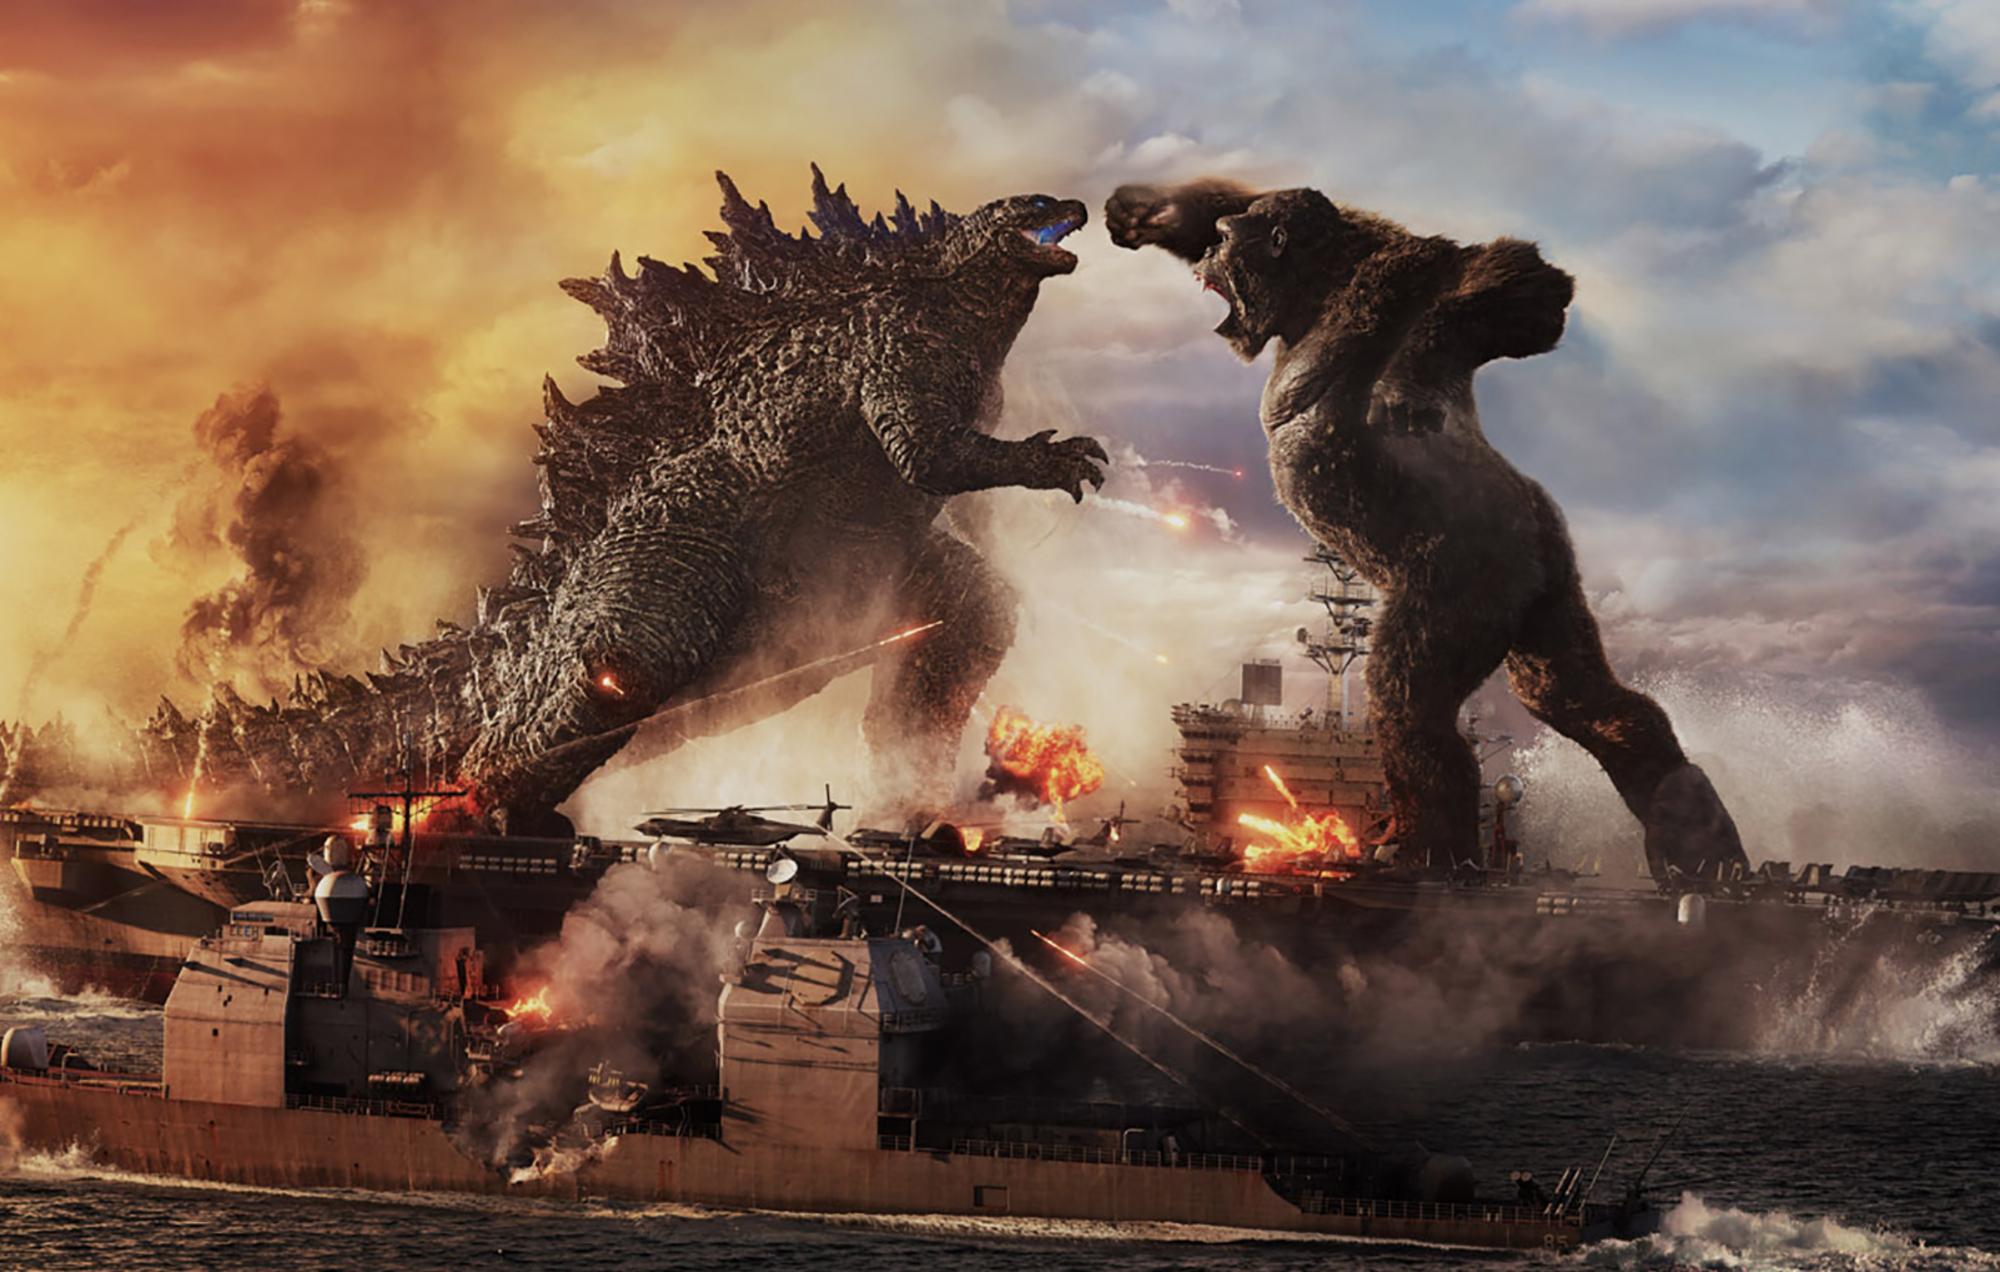 Godzilla Vs. Kong Warner Bros